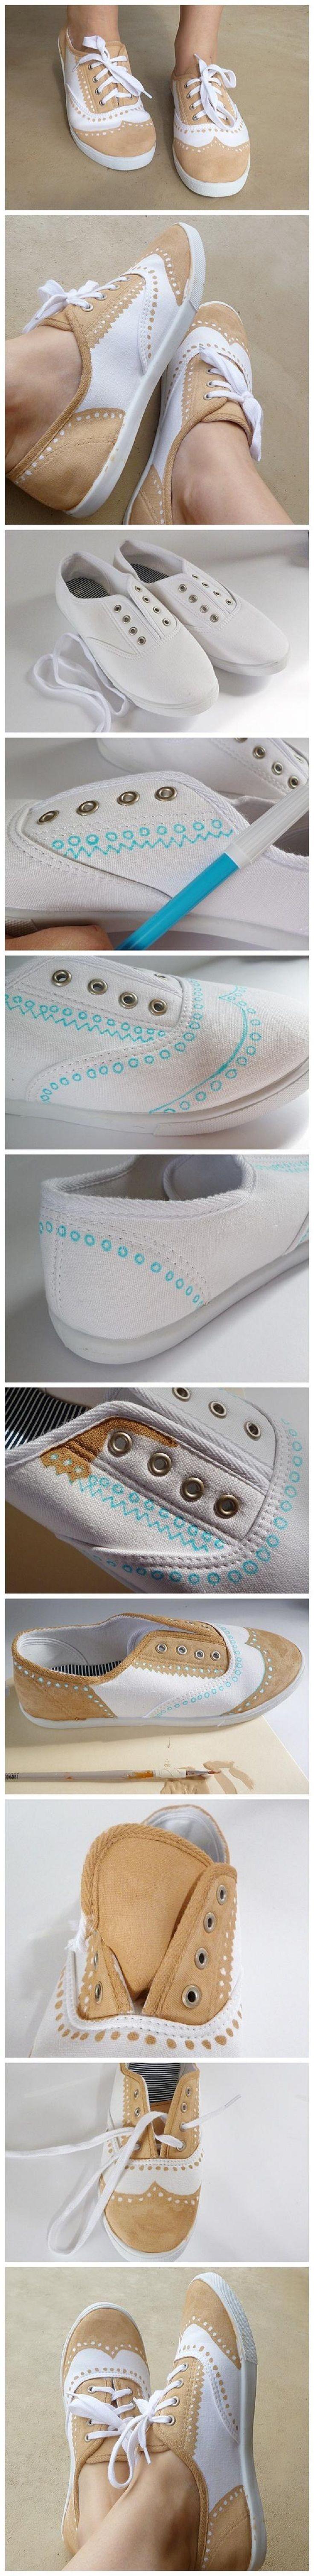 Zapatos para mujer. Utiliza Victorias blancas o similares. / Female shoes. Use white Victorias or similar. #shoe #craft